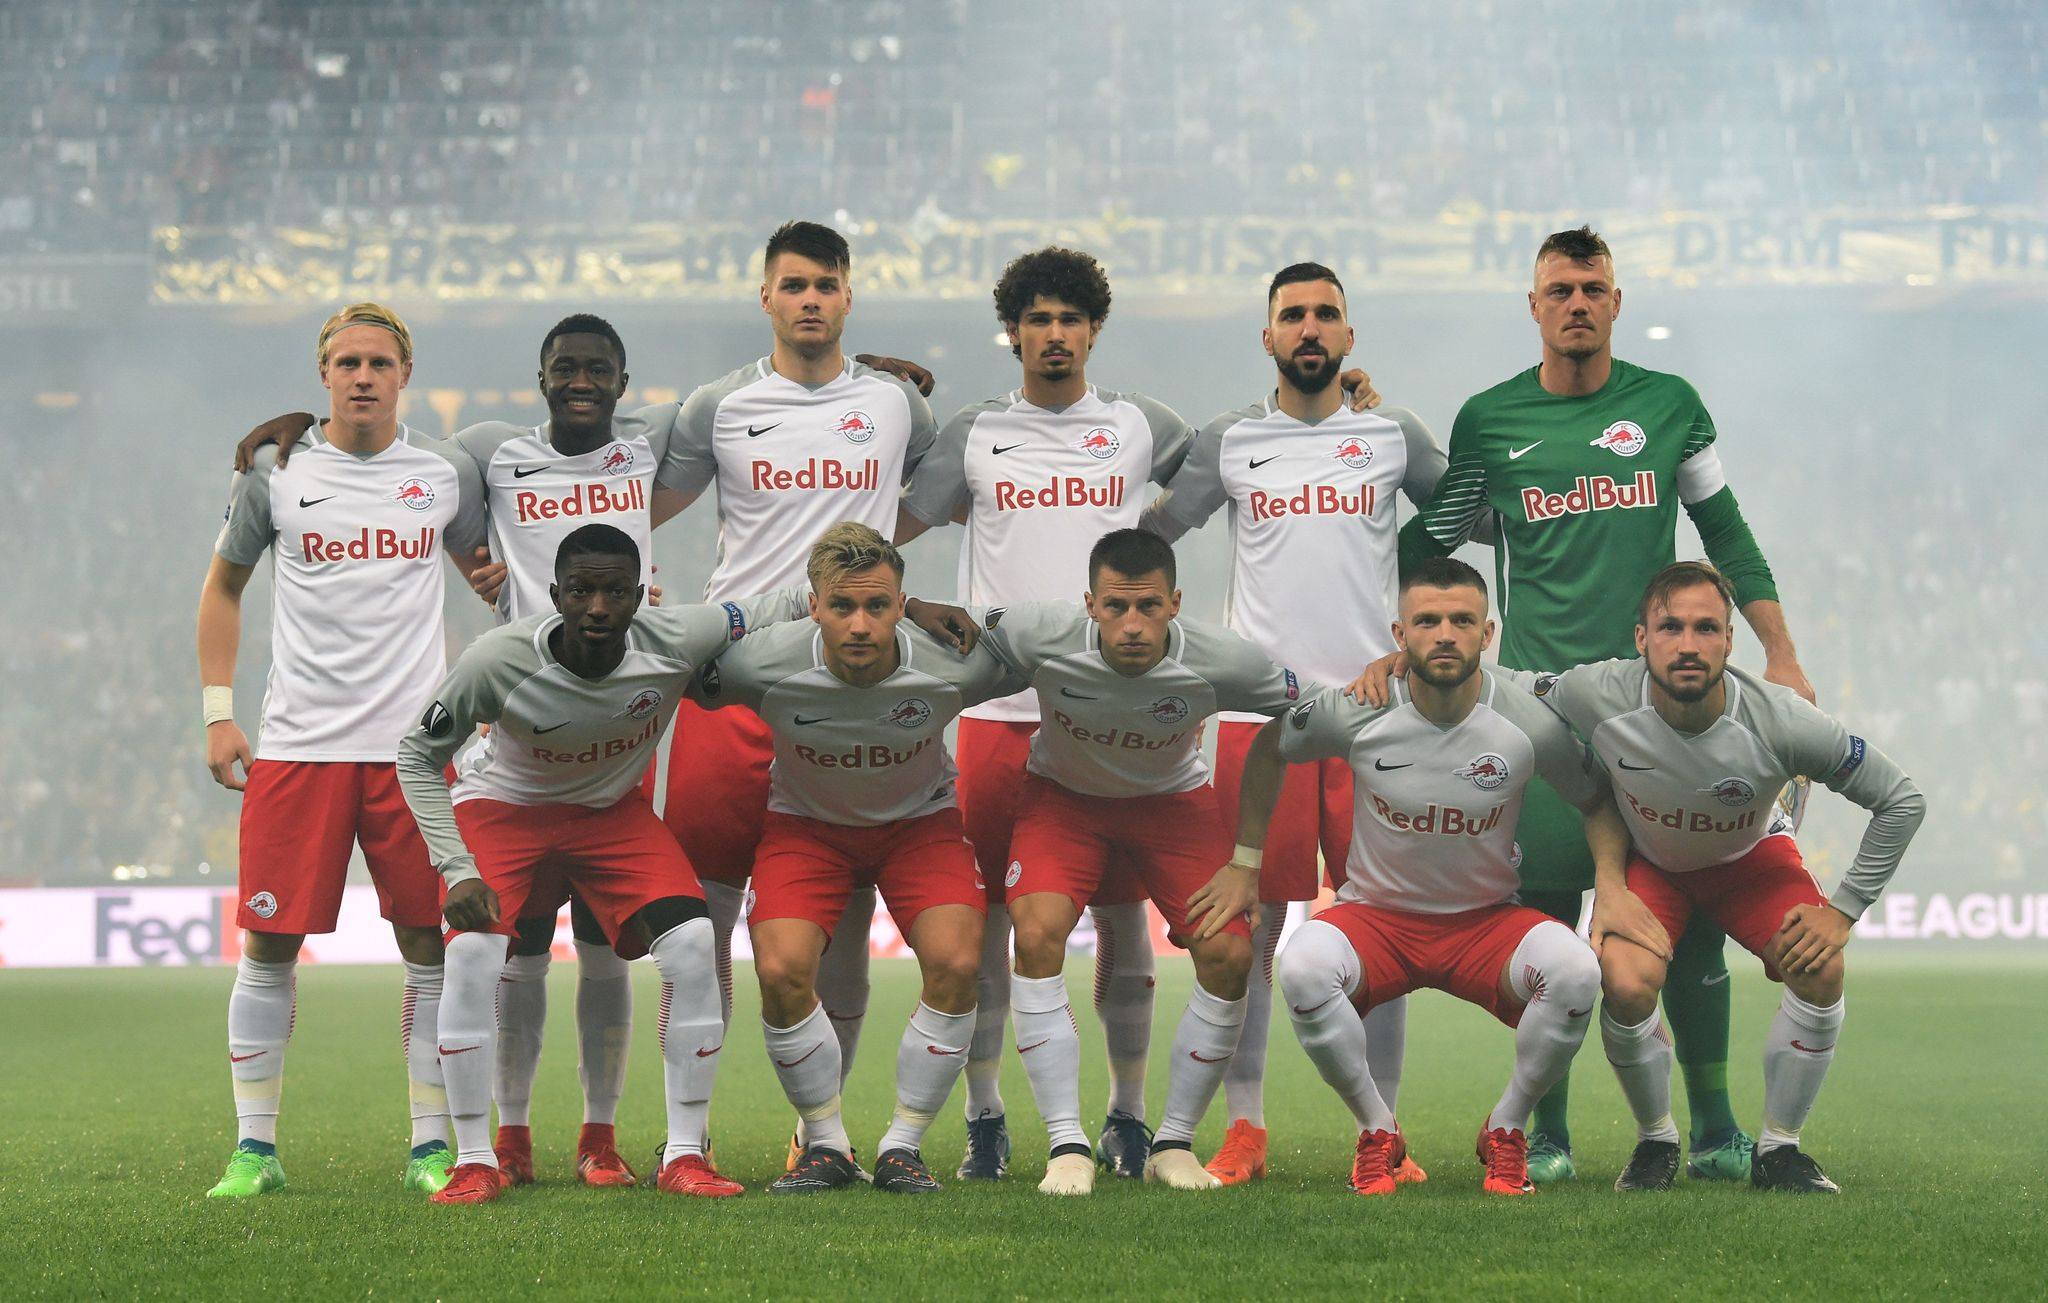 New form of FC Lokomotiv for 2018-2019 year 41